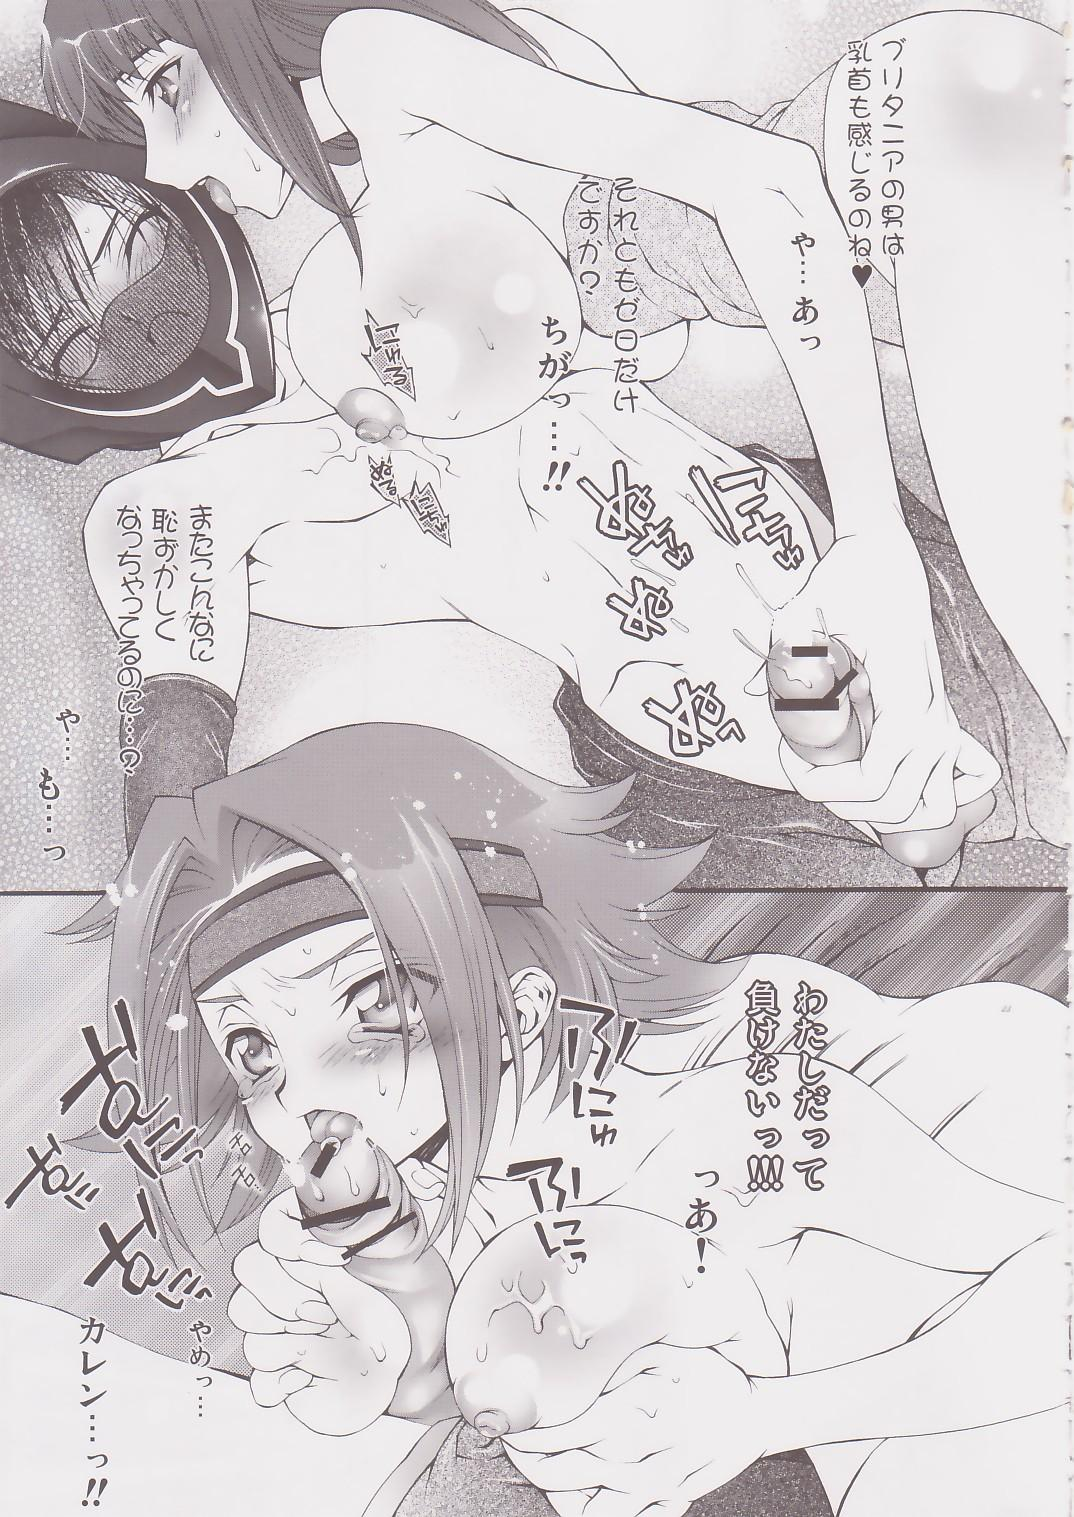 (COMIC1) [iYou (Mizuno Poppo, Yukkyun)] Britannia Tenseki Sui - Britannia The Scriptures - tipsy (CODE GEASS: Lelouch of the Rebellion) 21